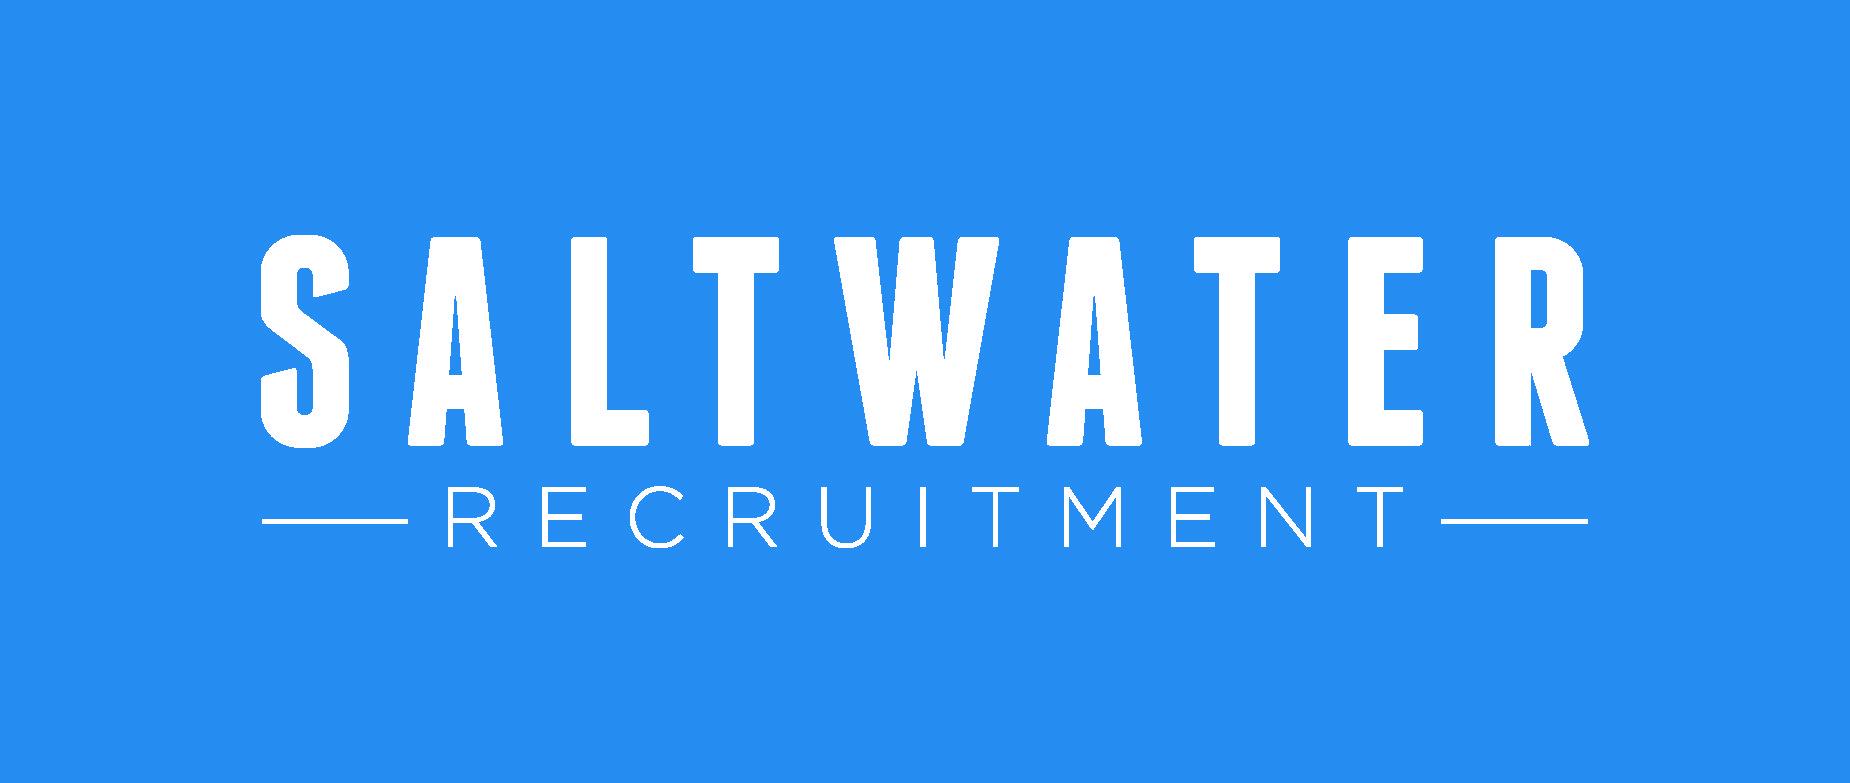 Saltwater Recruitment